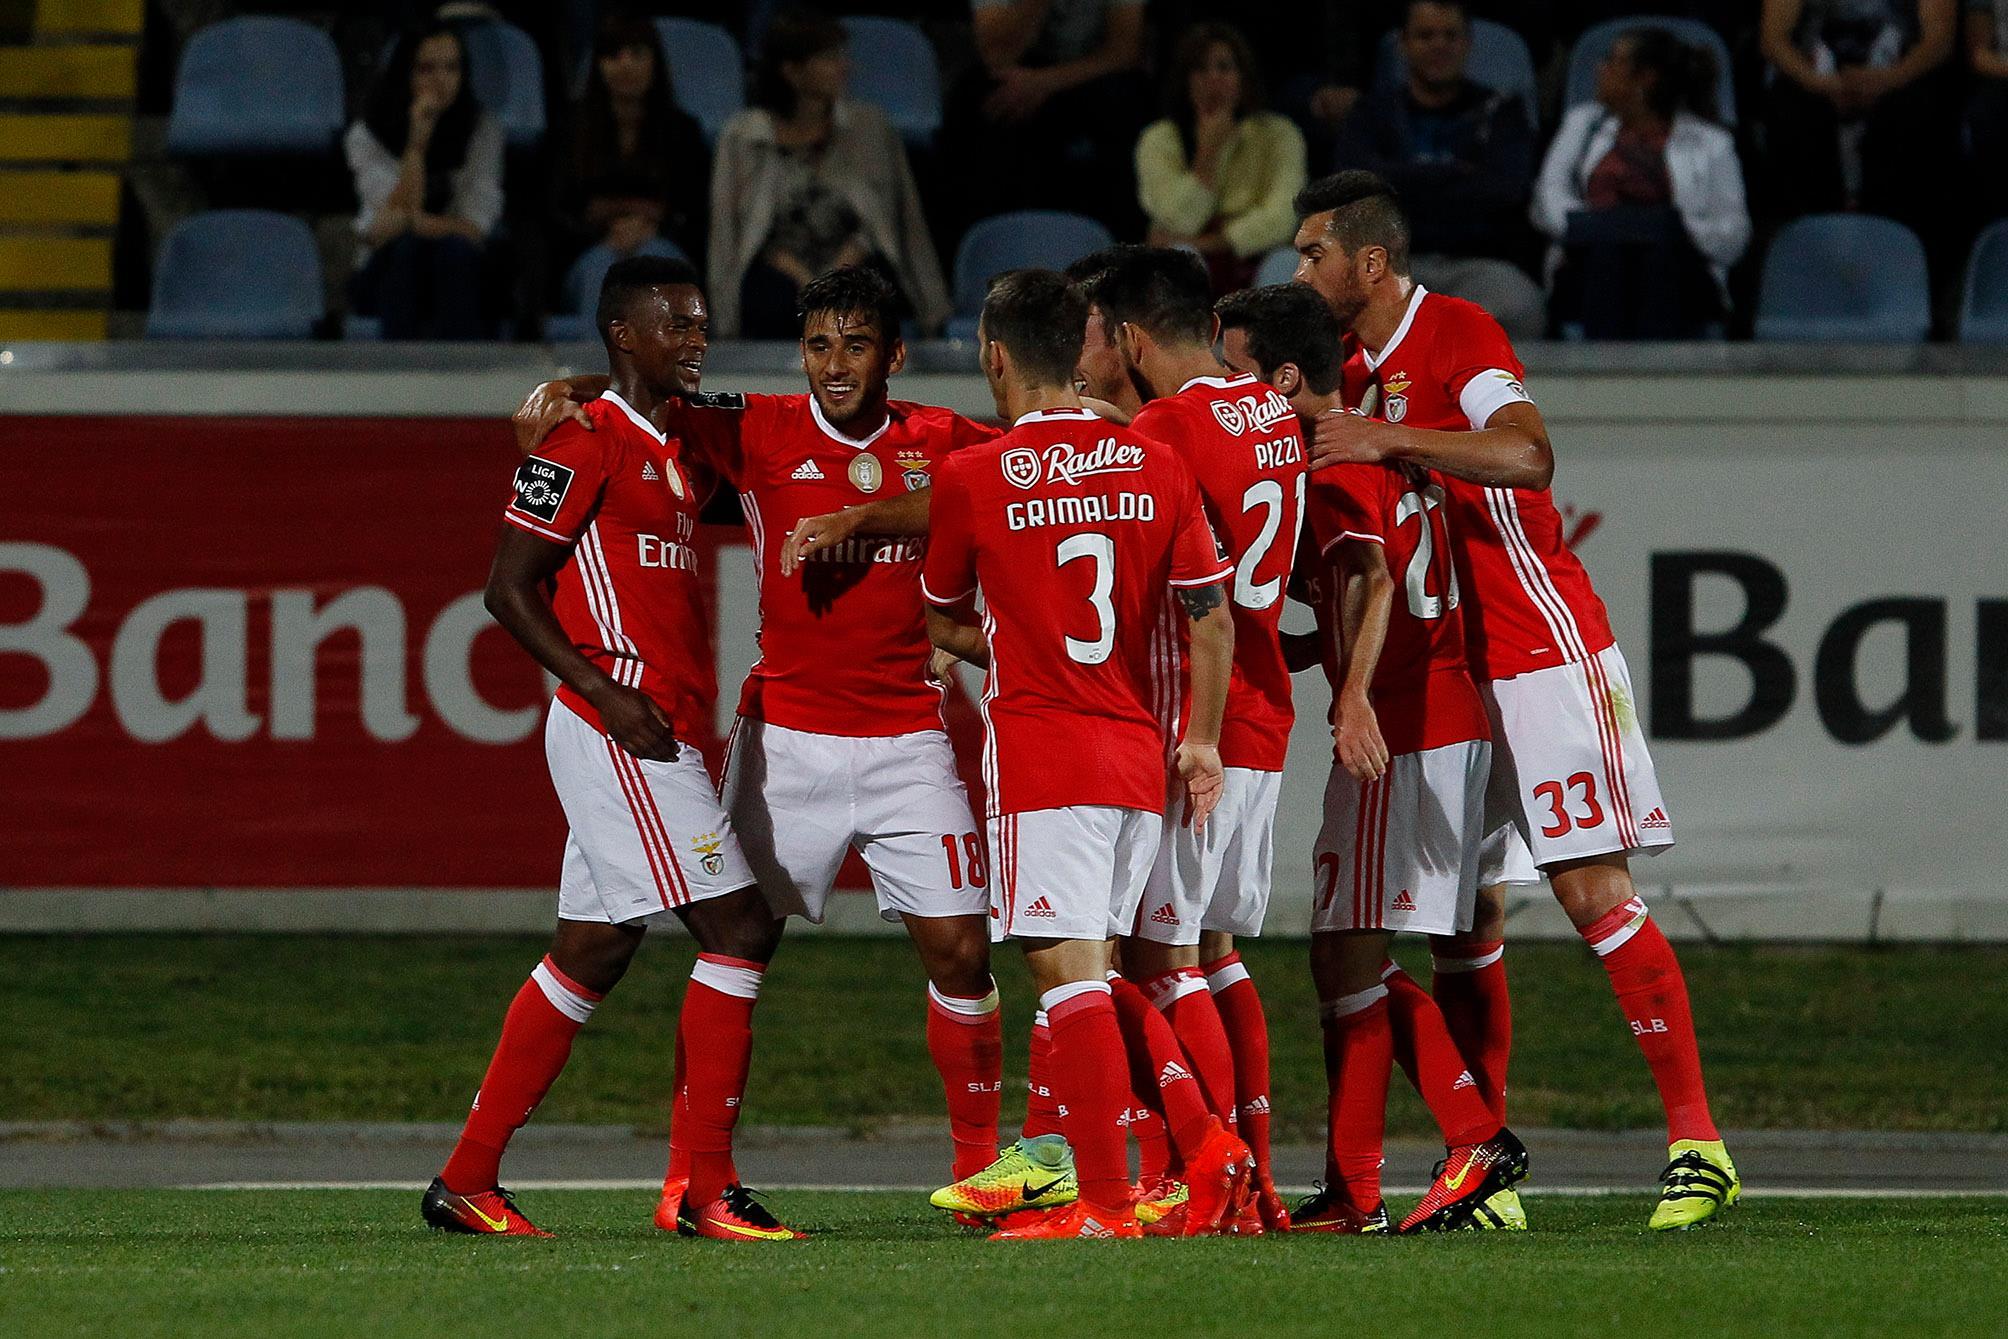 Resumo do Arouca 1-2 SL Benfica